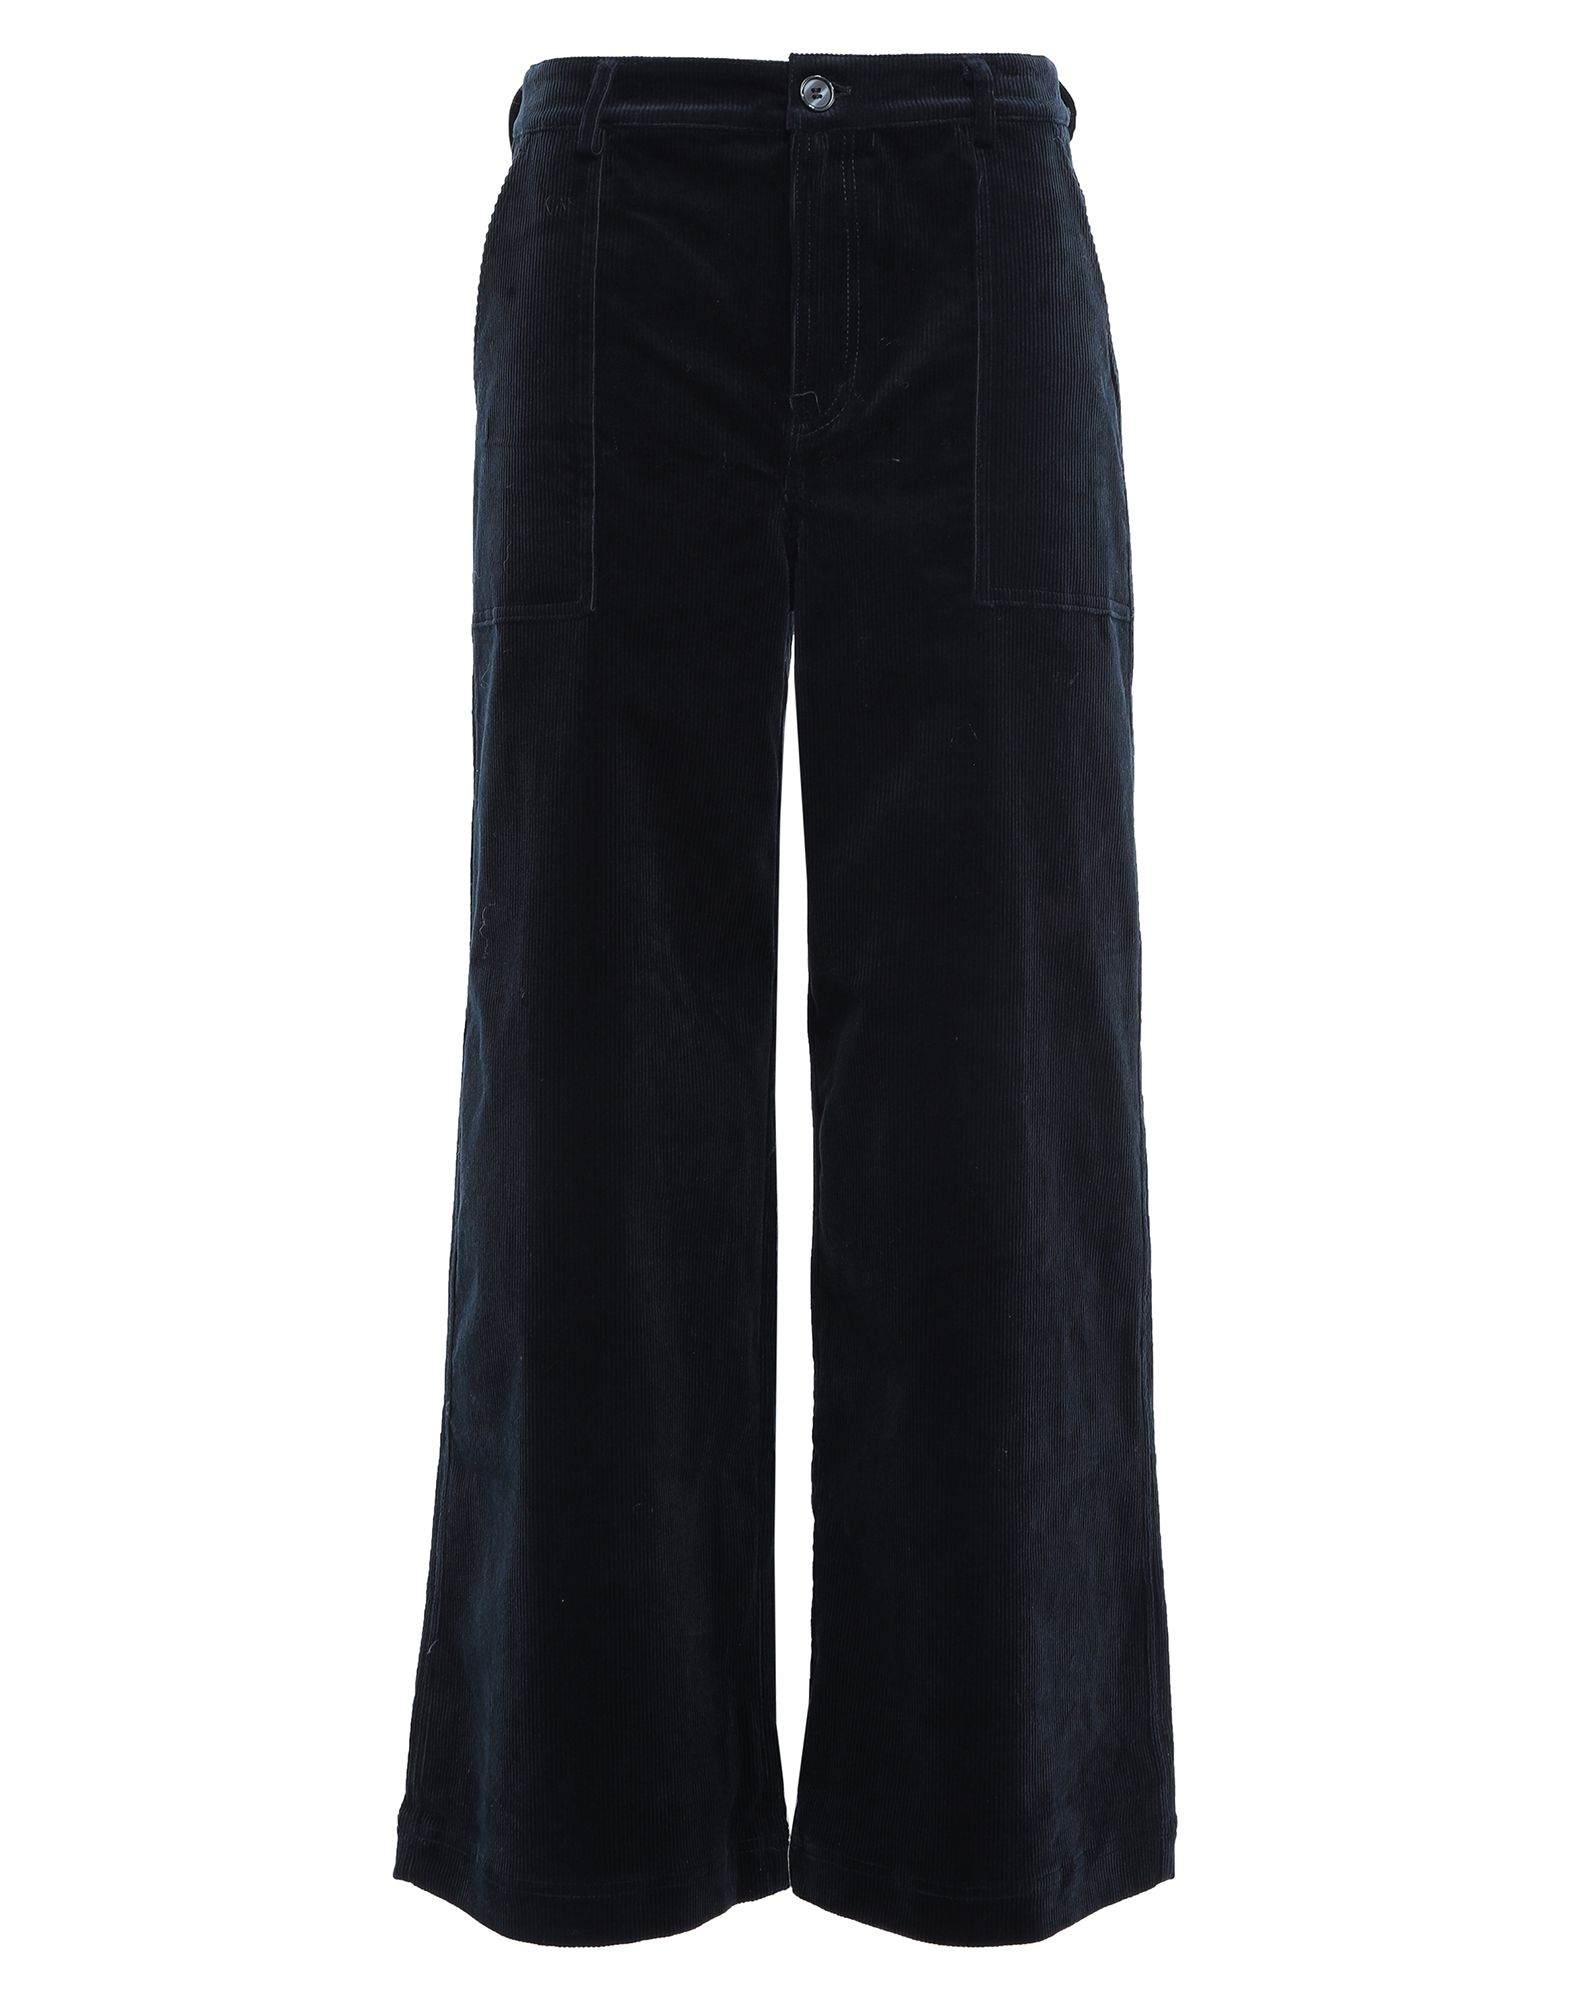 GANNI Casual pants. velvet, ribbed, no appliqués, basic solid color, high waisted, regular fit, flare & wide-leg, button, zip, multipockets, stretch, pants. 98% Cotton, 2% Elastane